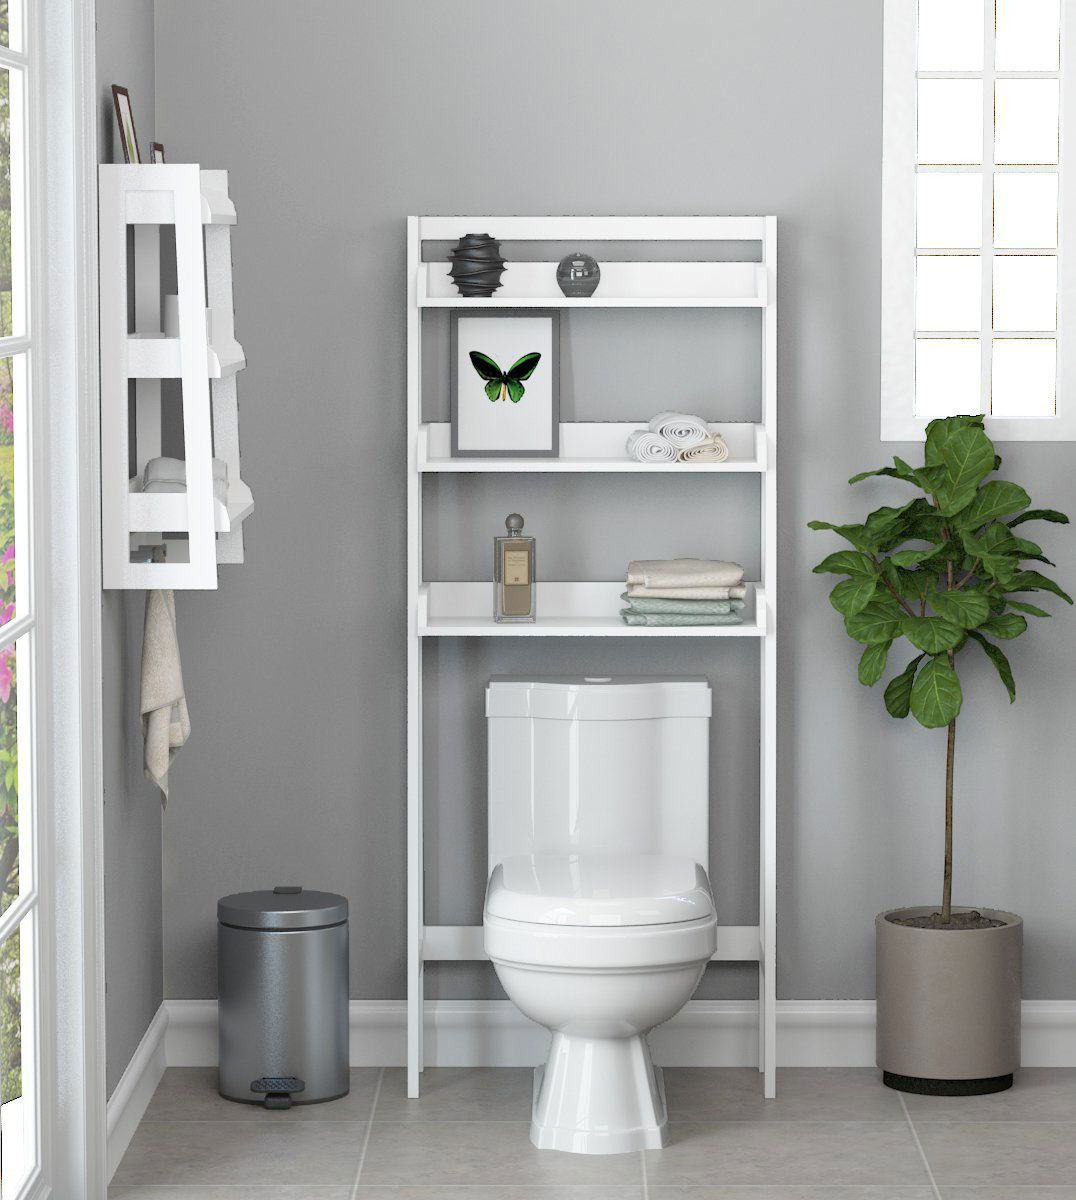 5 Best Over The Toilet Storage Ideas On Amazon 2019 The Strategist New York Magazine